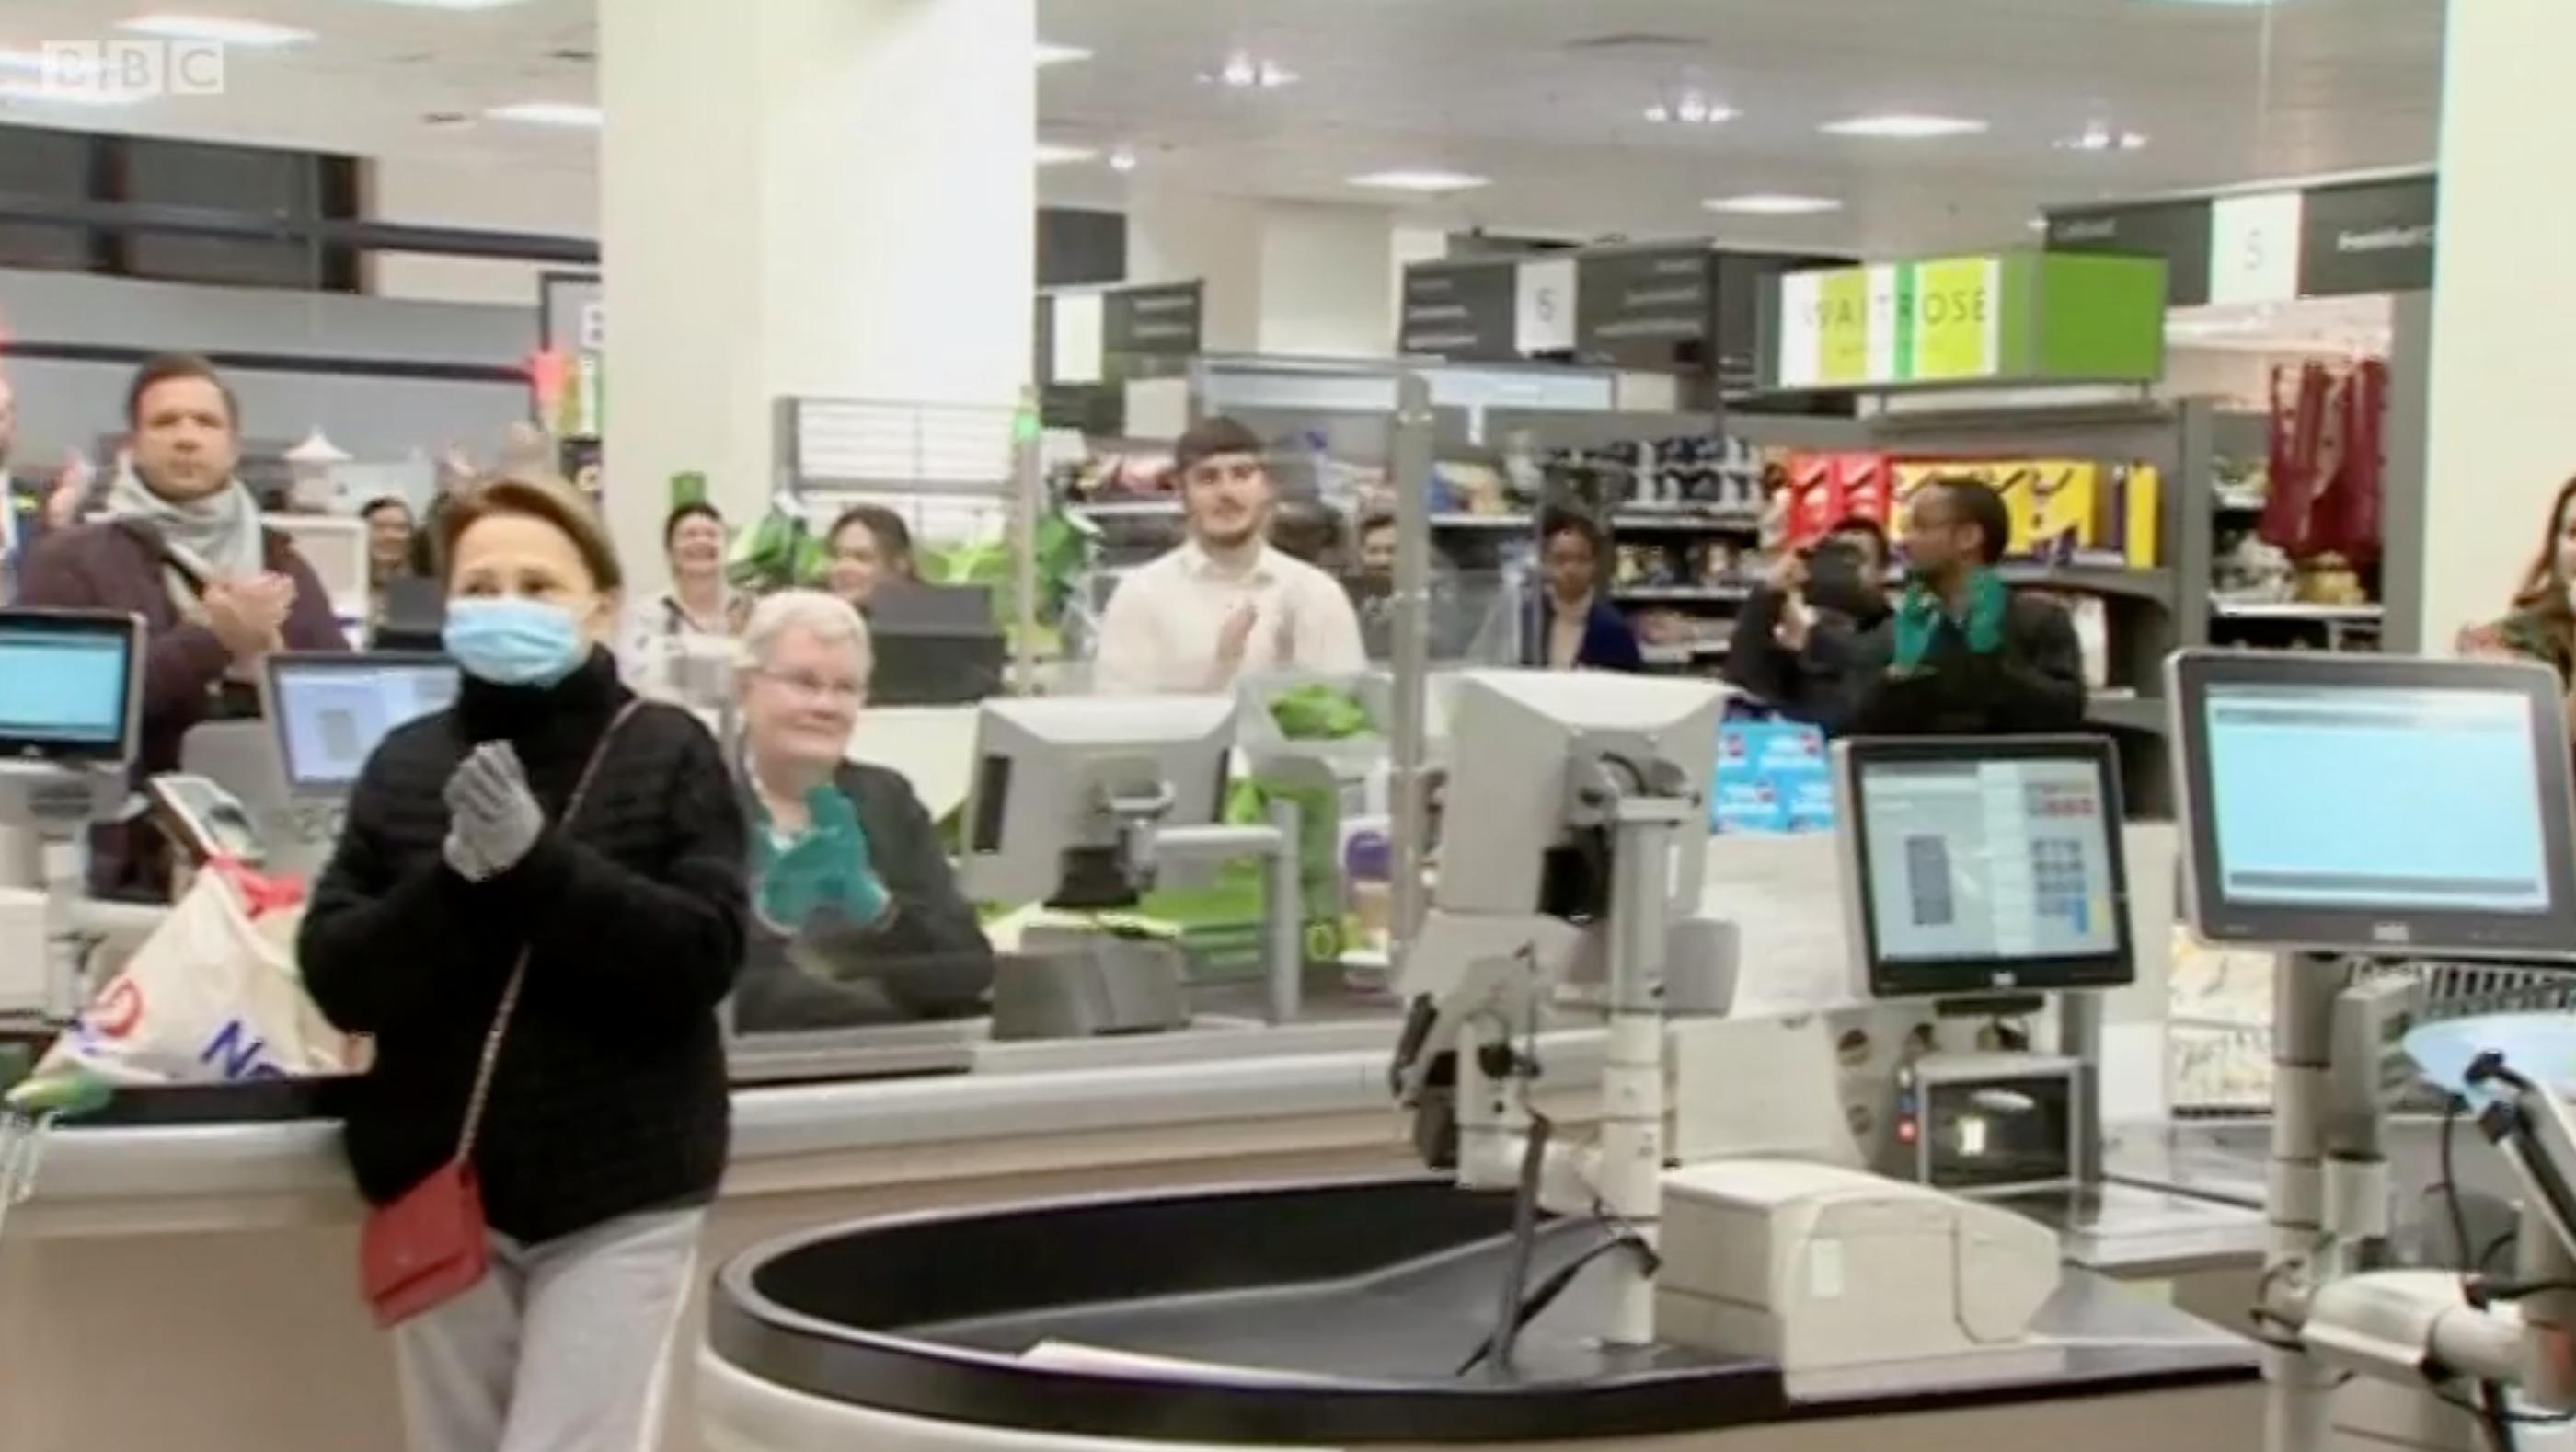 the queen coronavirus speech (Credit: BBC)